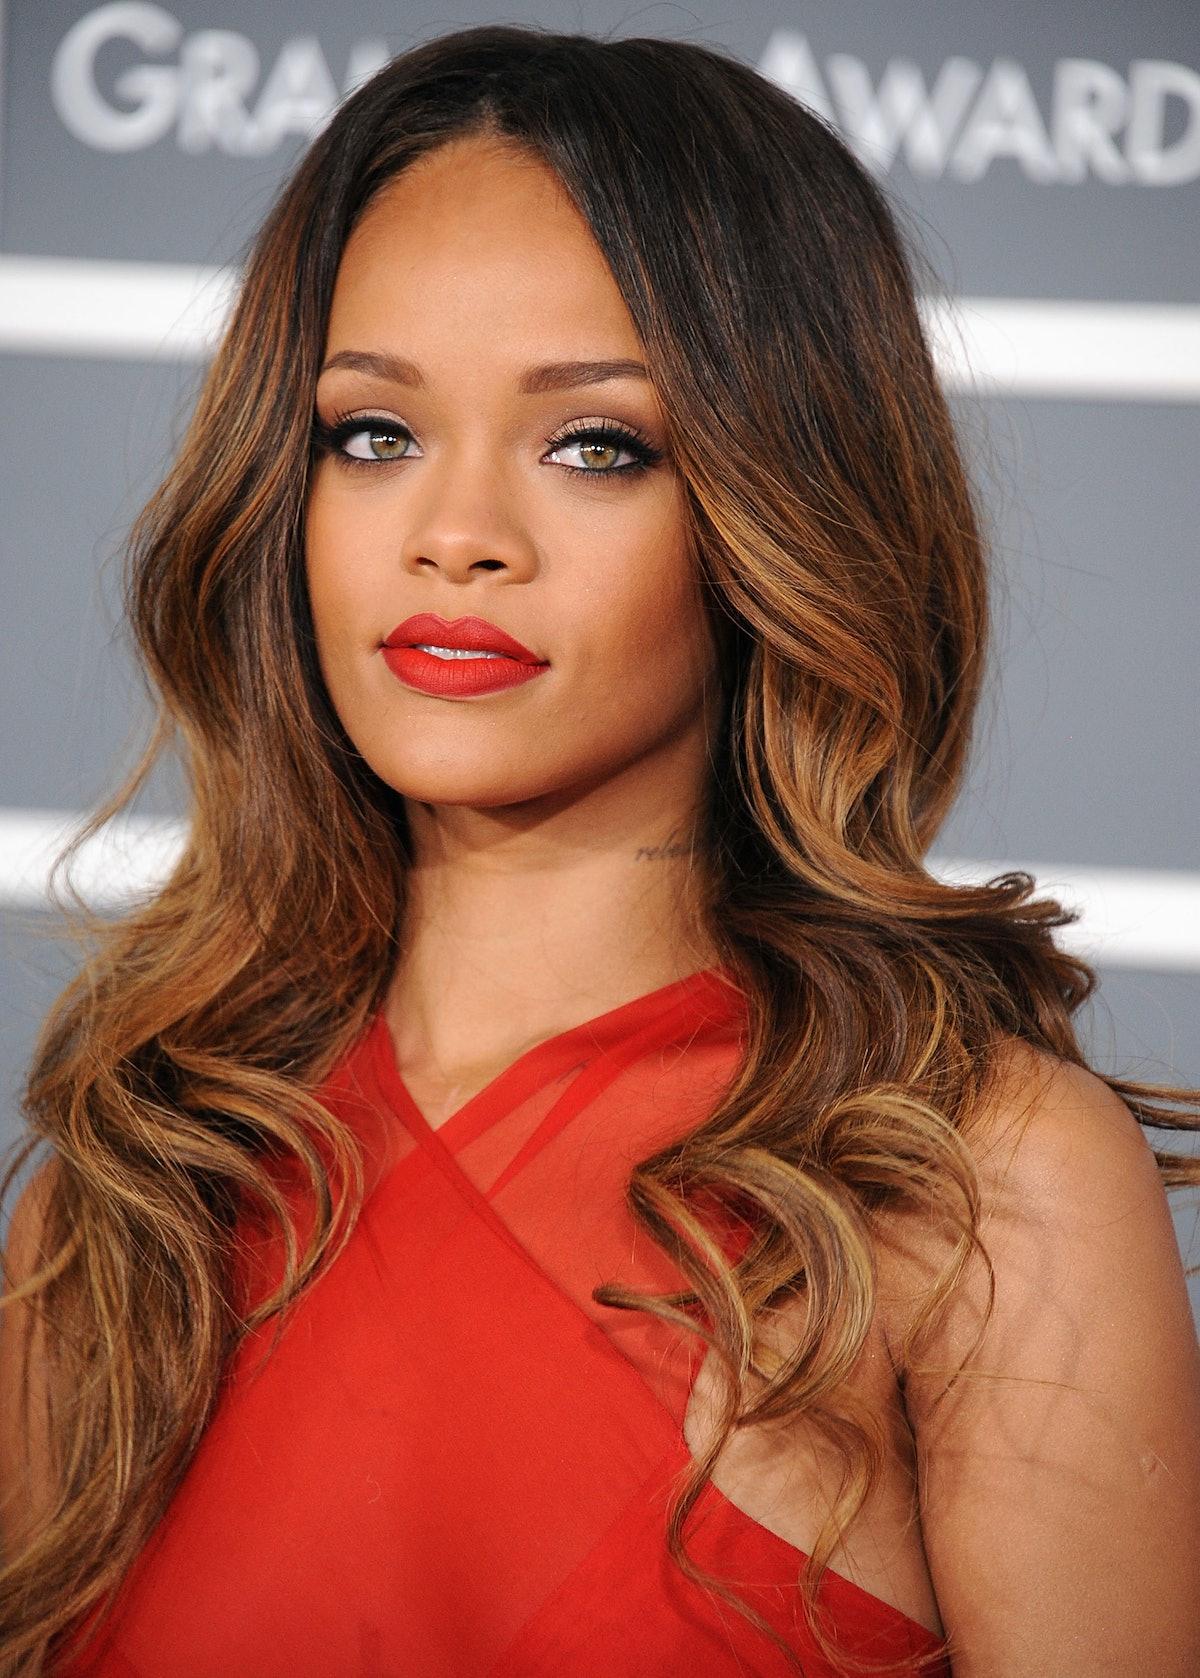 Rihanna arrives at the The 55th Annual GRAMMY Awards